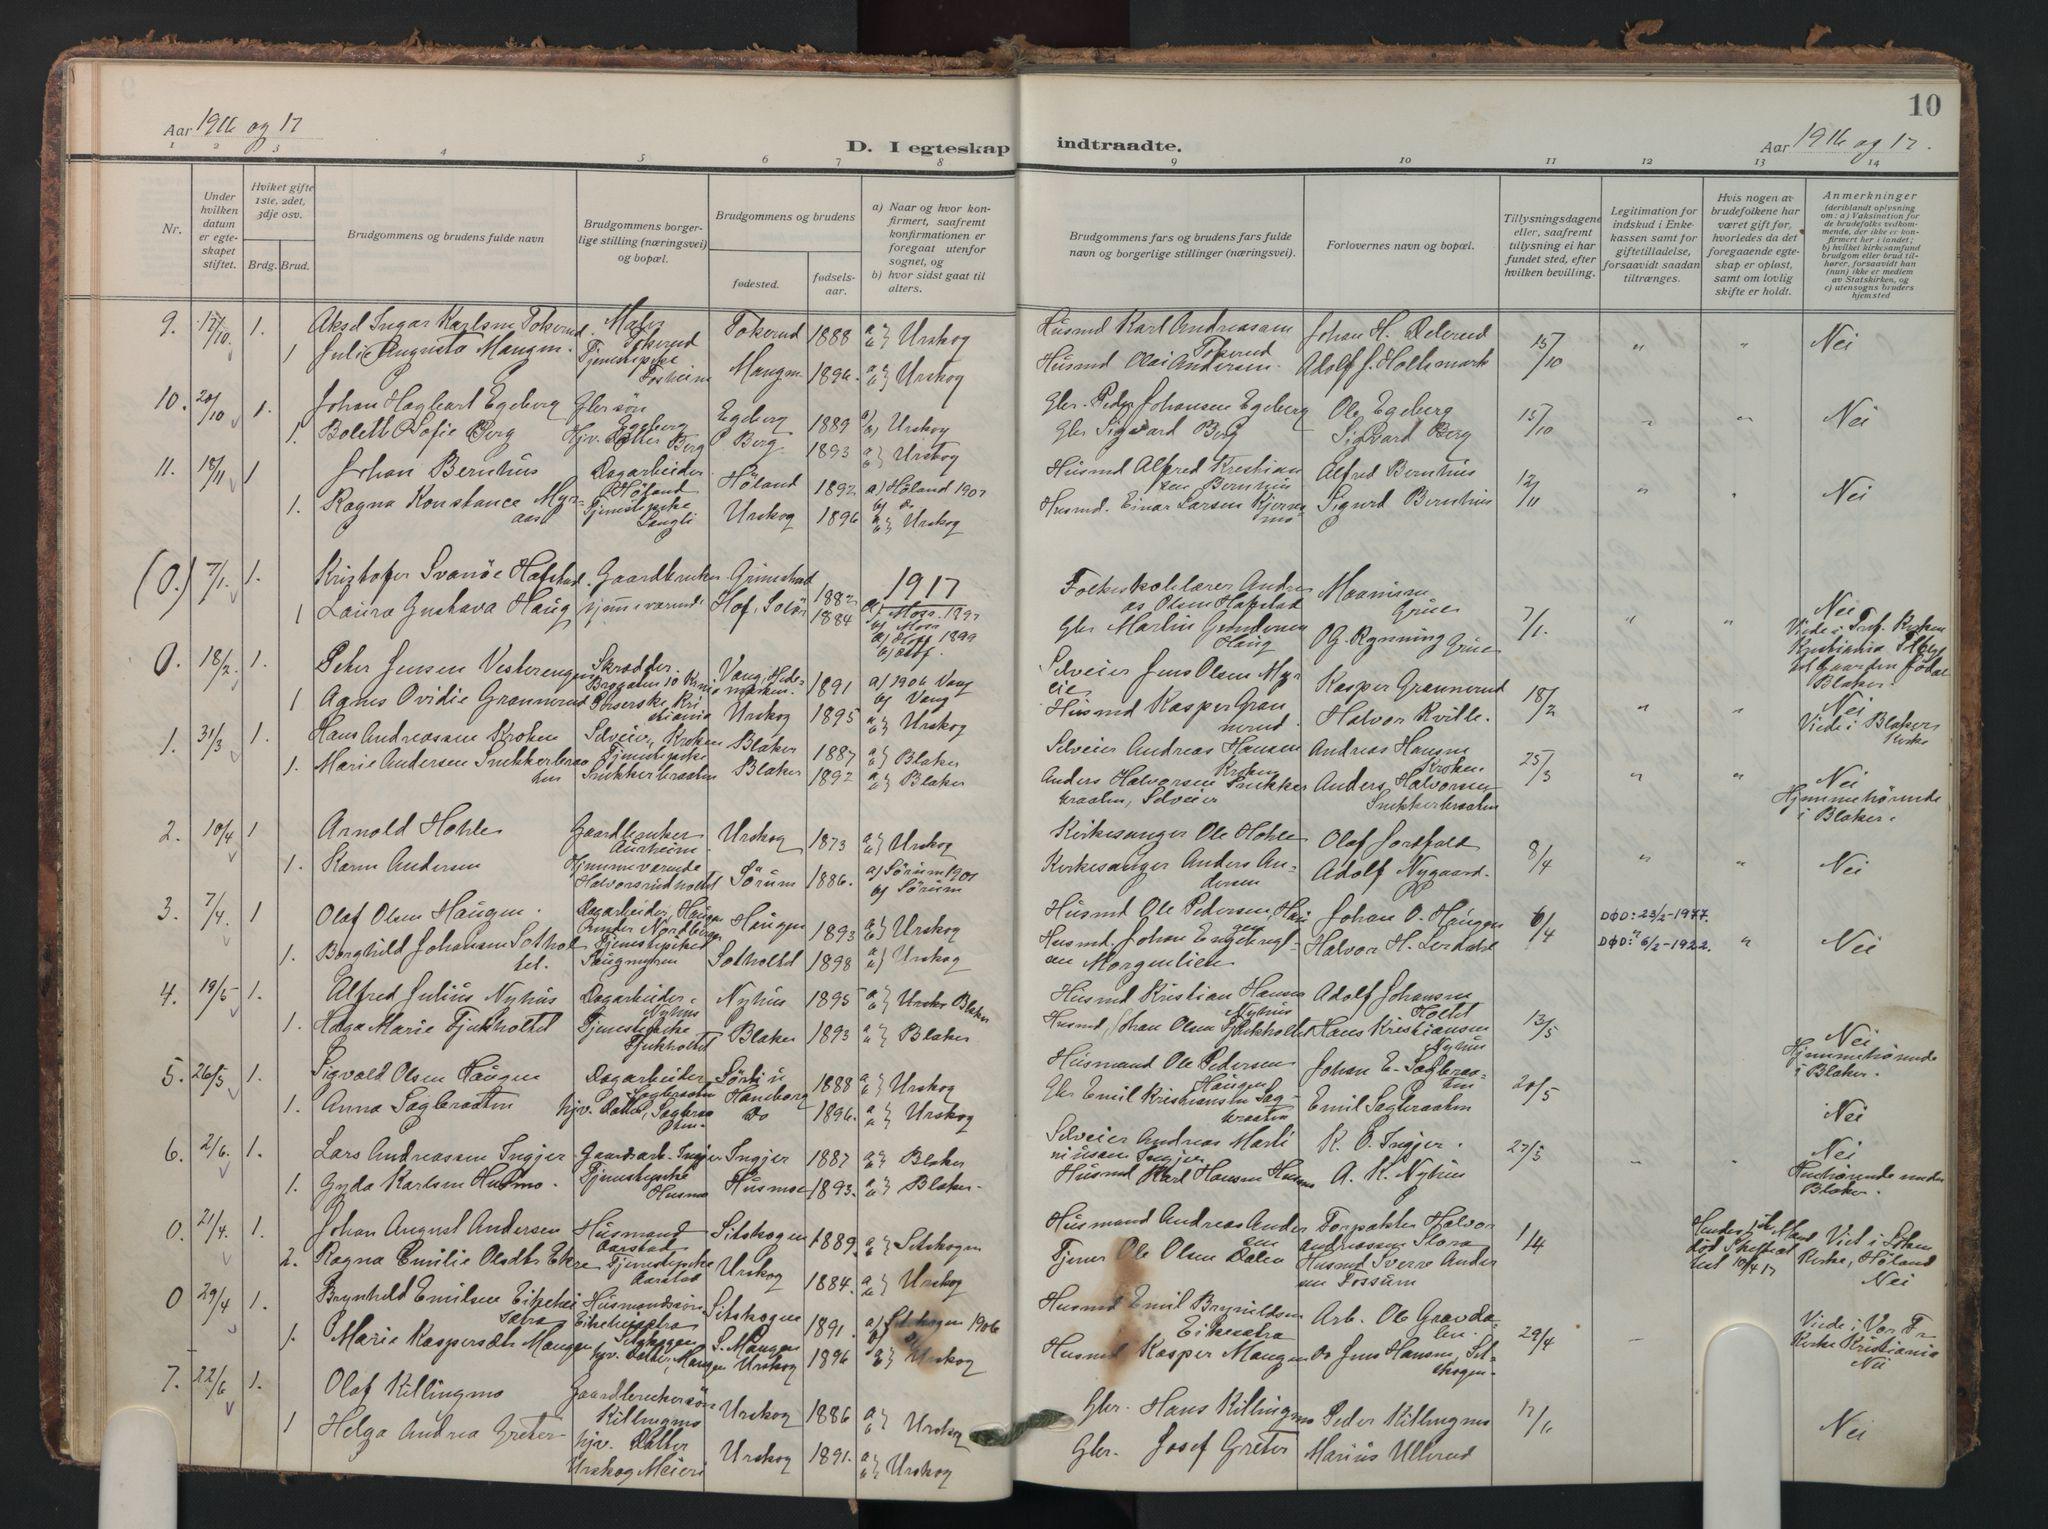 SAO, Aurskog prestekontor Kirkebøker, F/Fa/L0016: Parish register (official) no. I 16, 1910-1934, p. 10